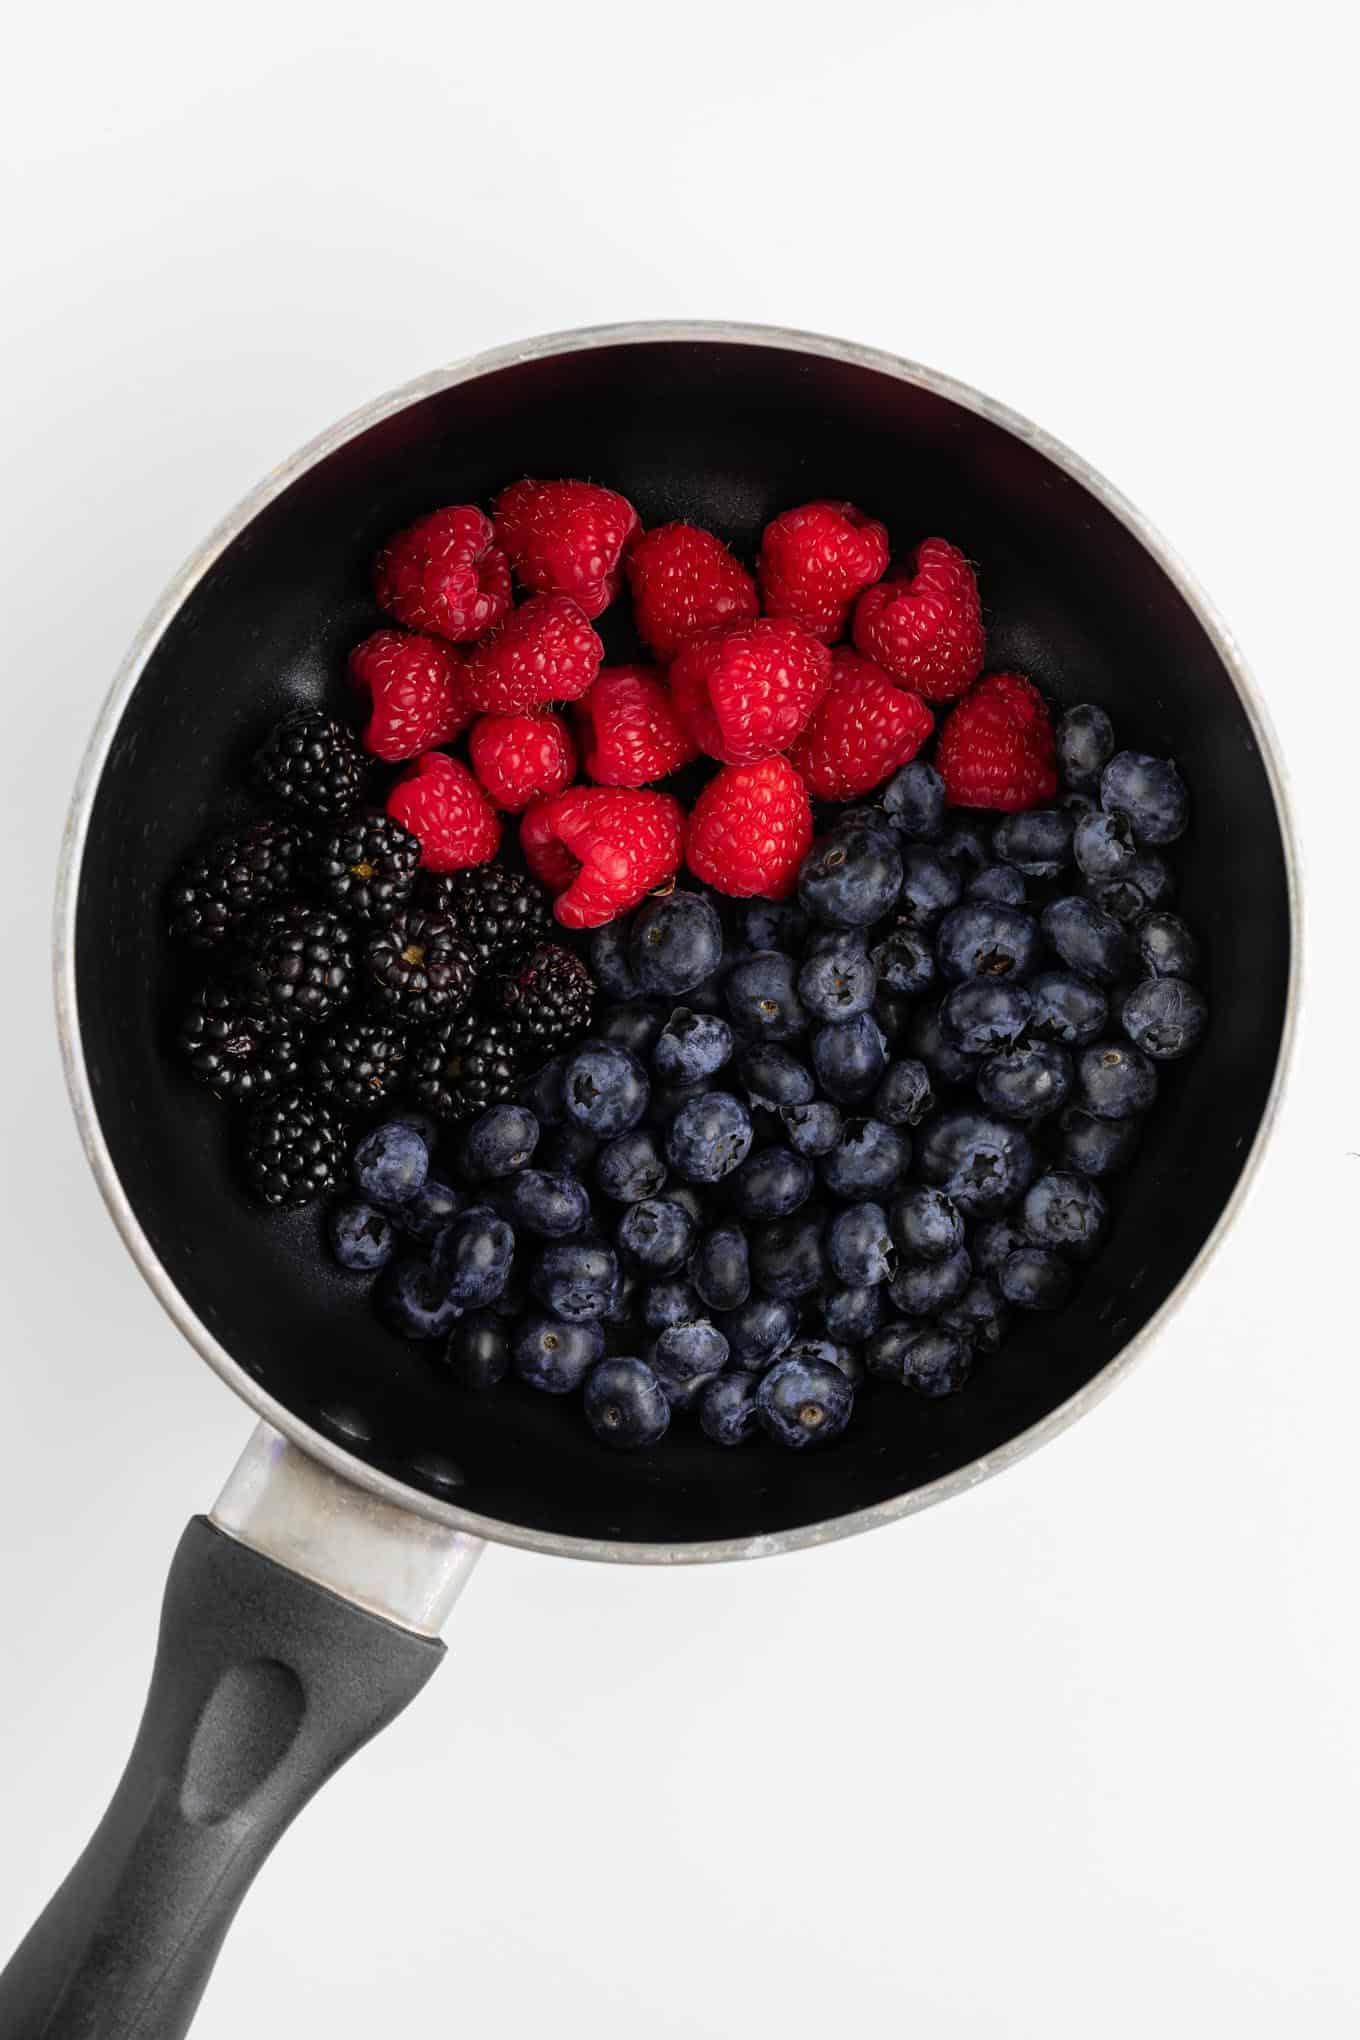 blueberries, raspberries, and blackberries inside a black sauce pot